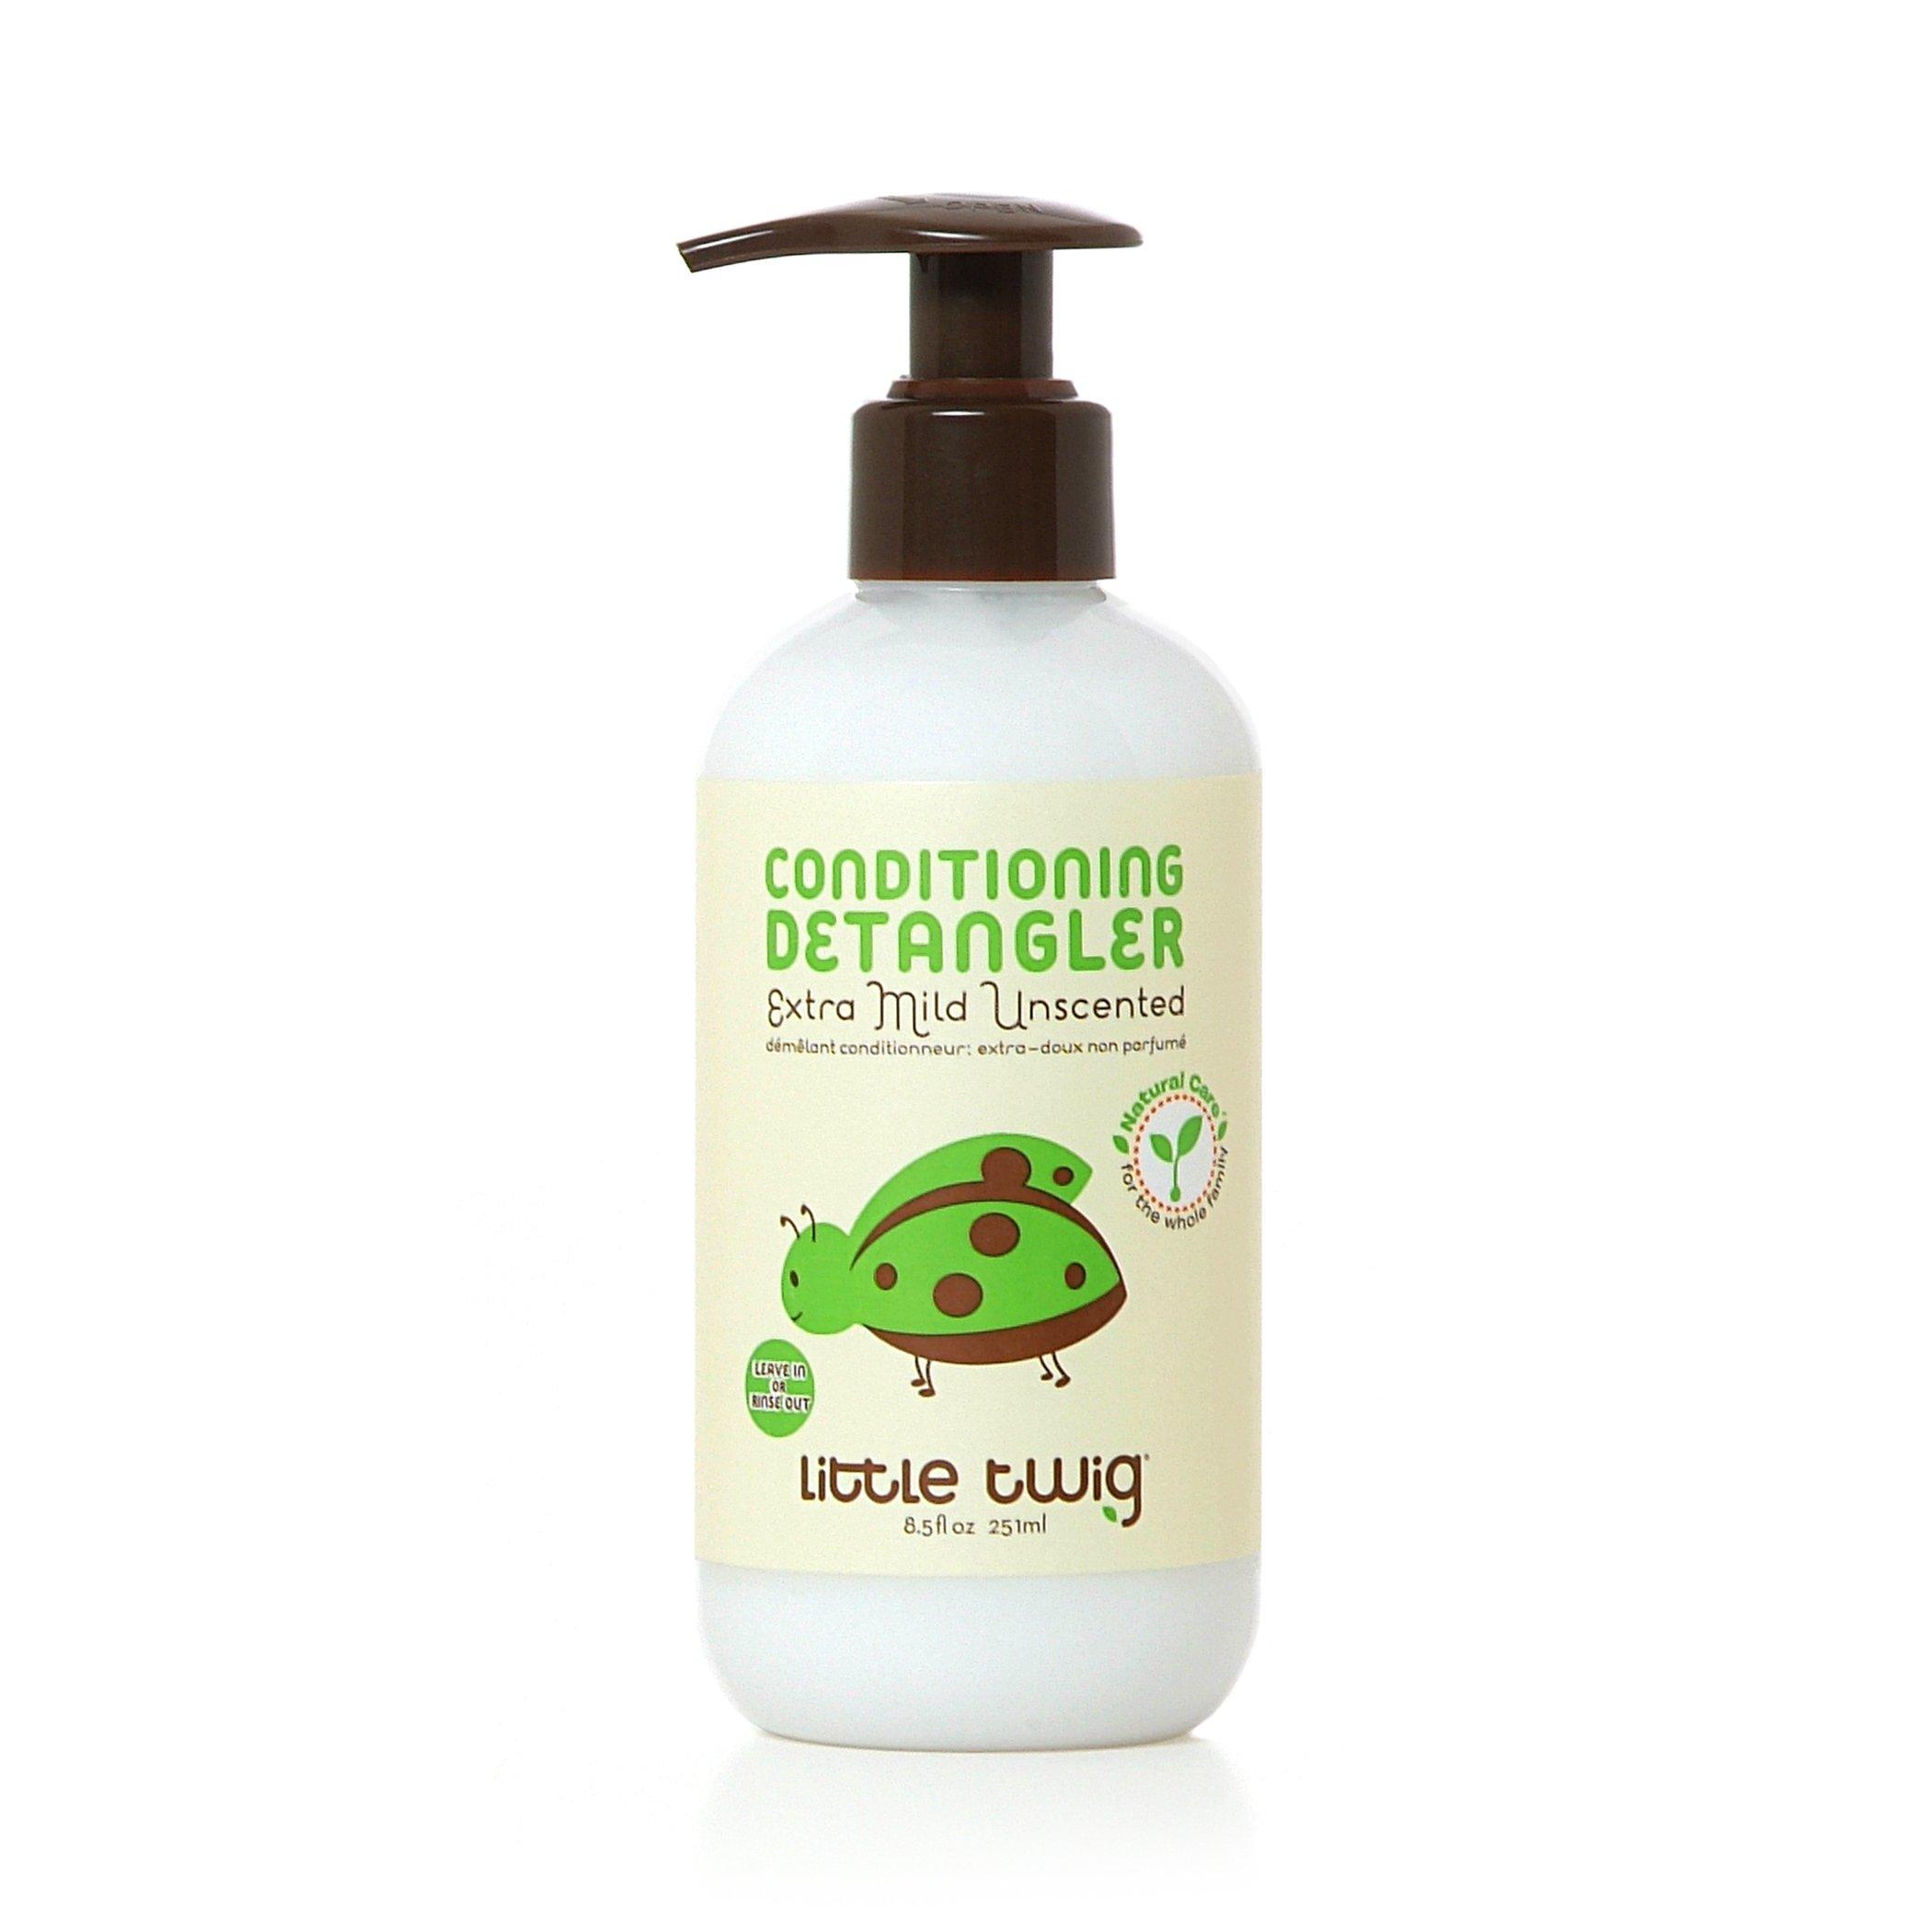 Little Twig All Natural, Hypoallergenic, Extra Mild Organic Conditioning Detangler for Sensitive Skin, Unscented, 8.5 Fluid Oz